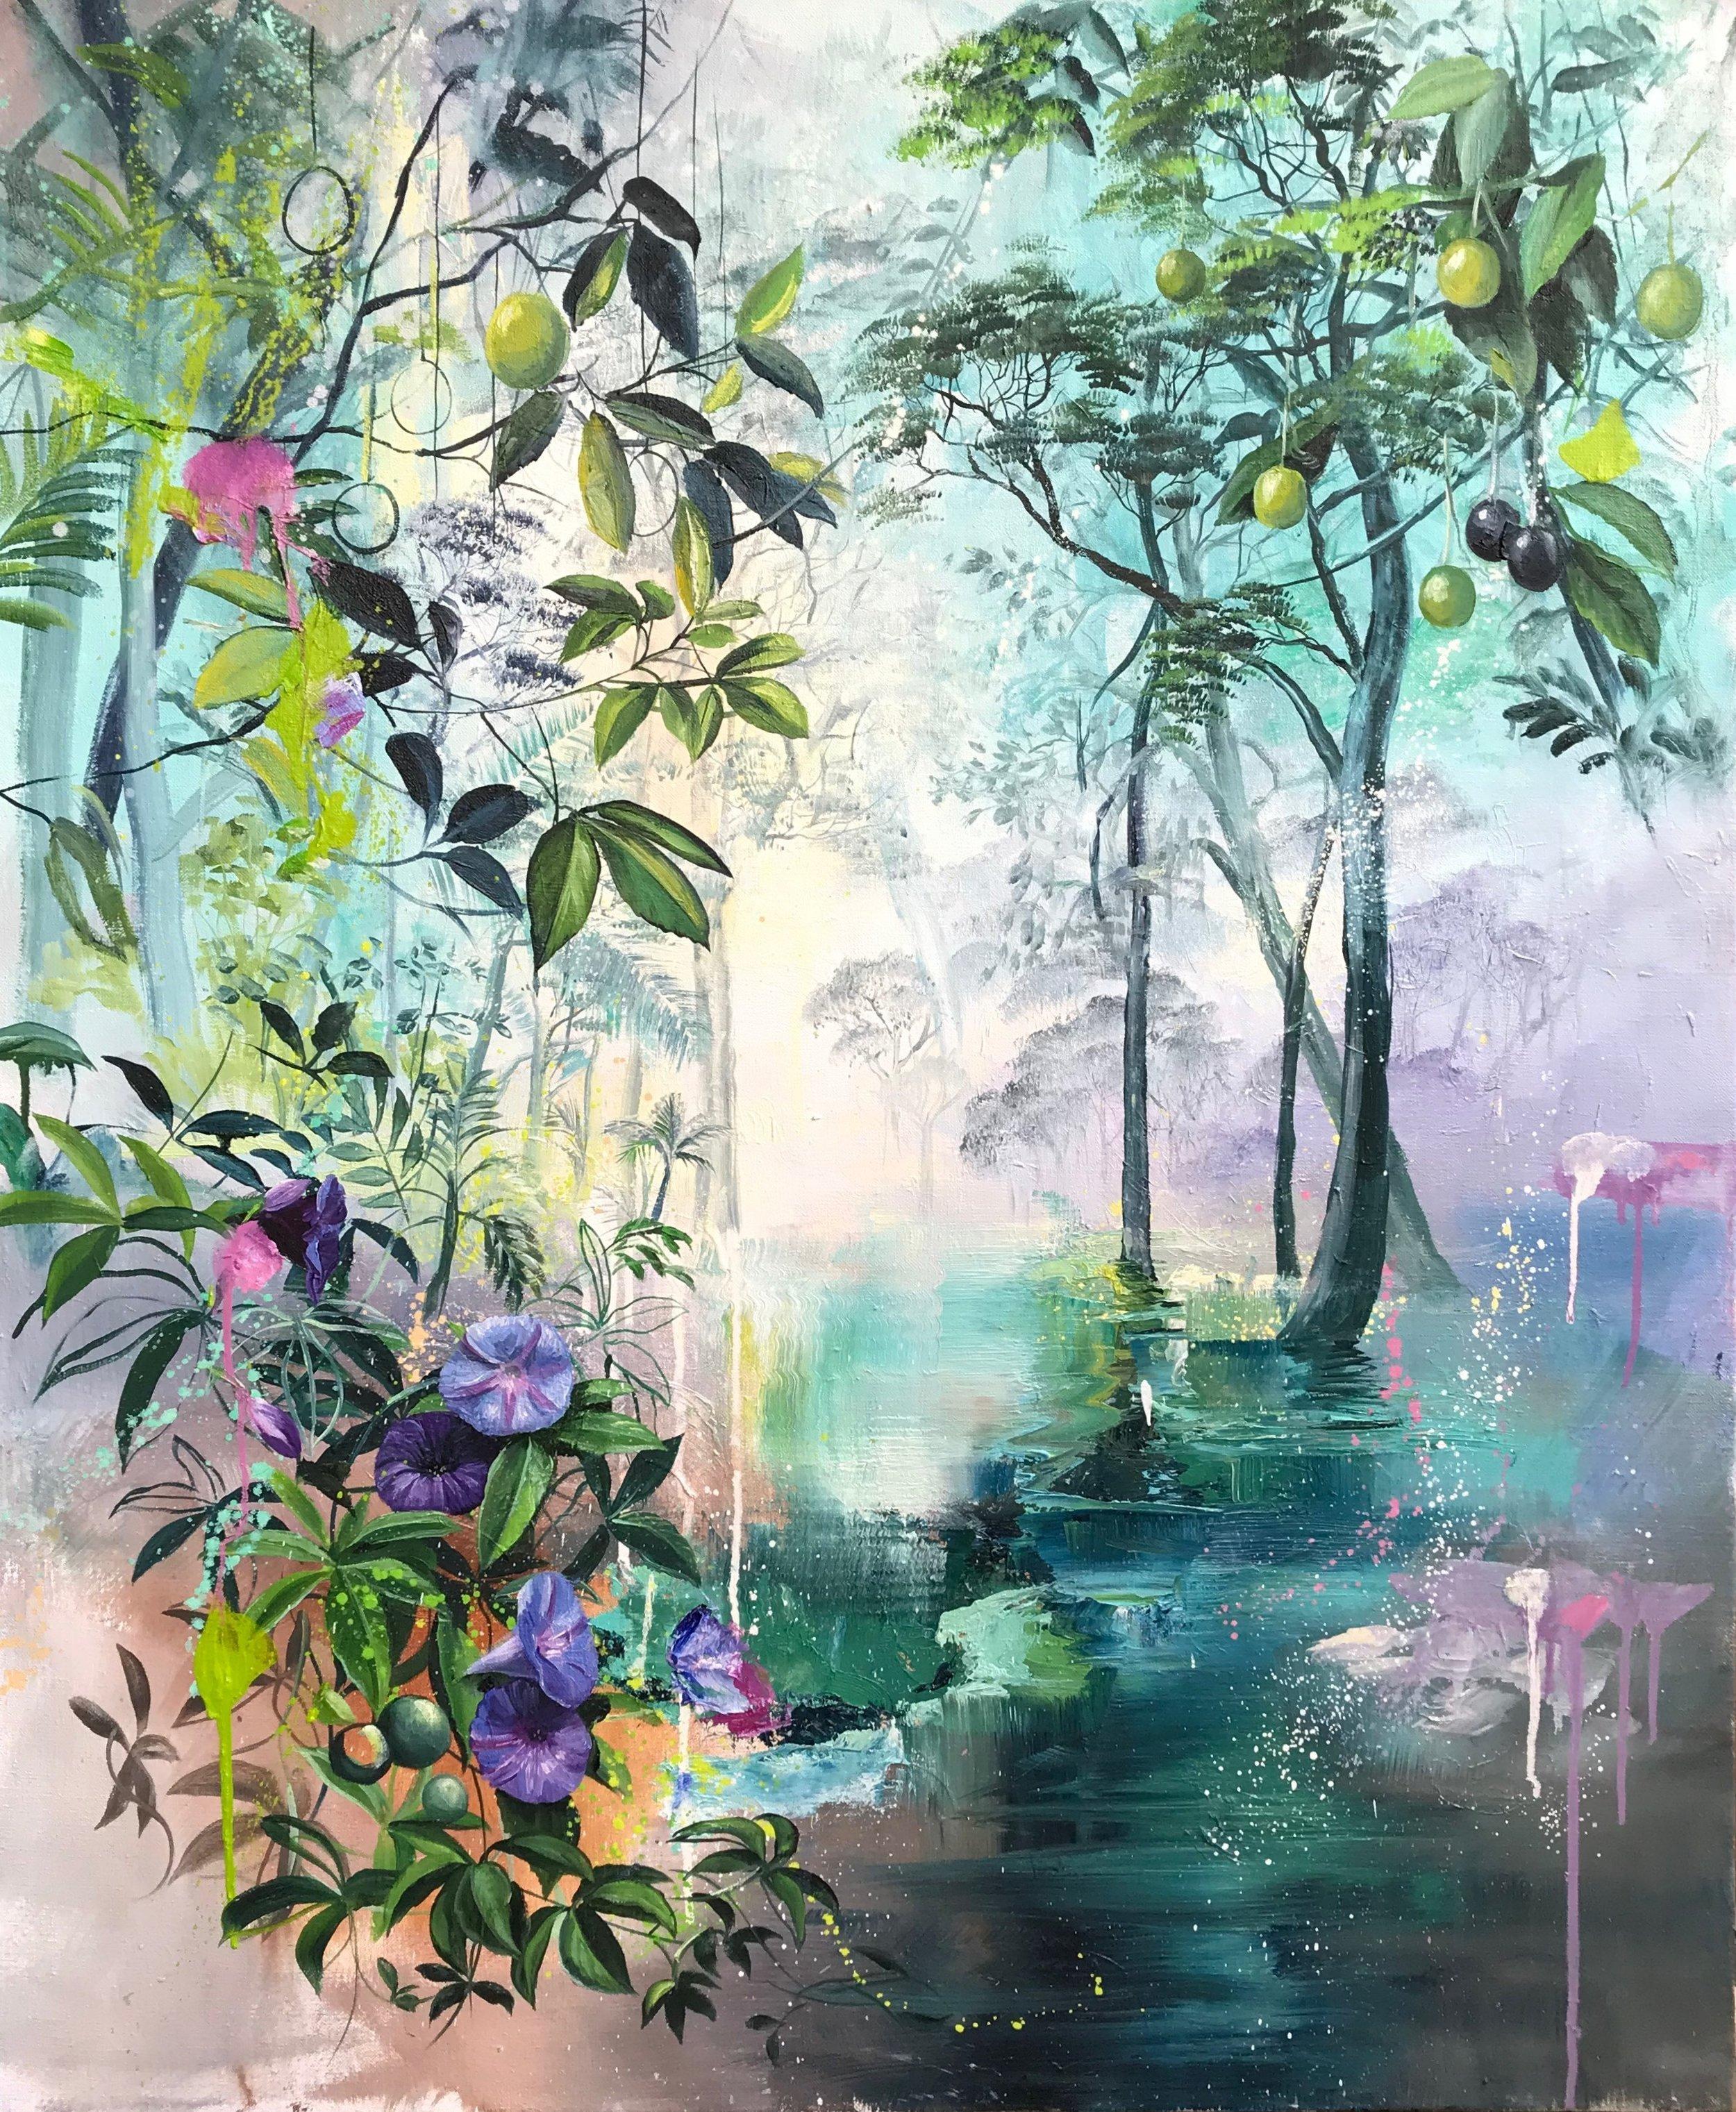 Secred Garden